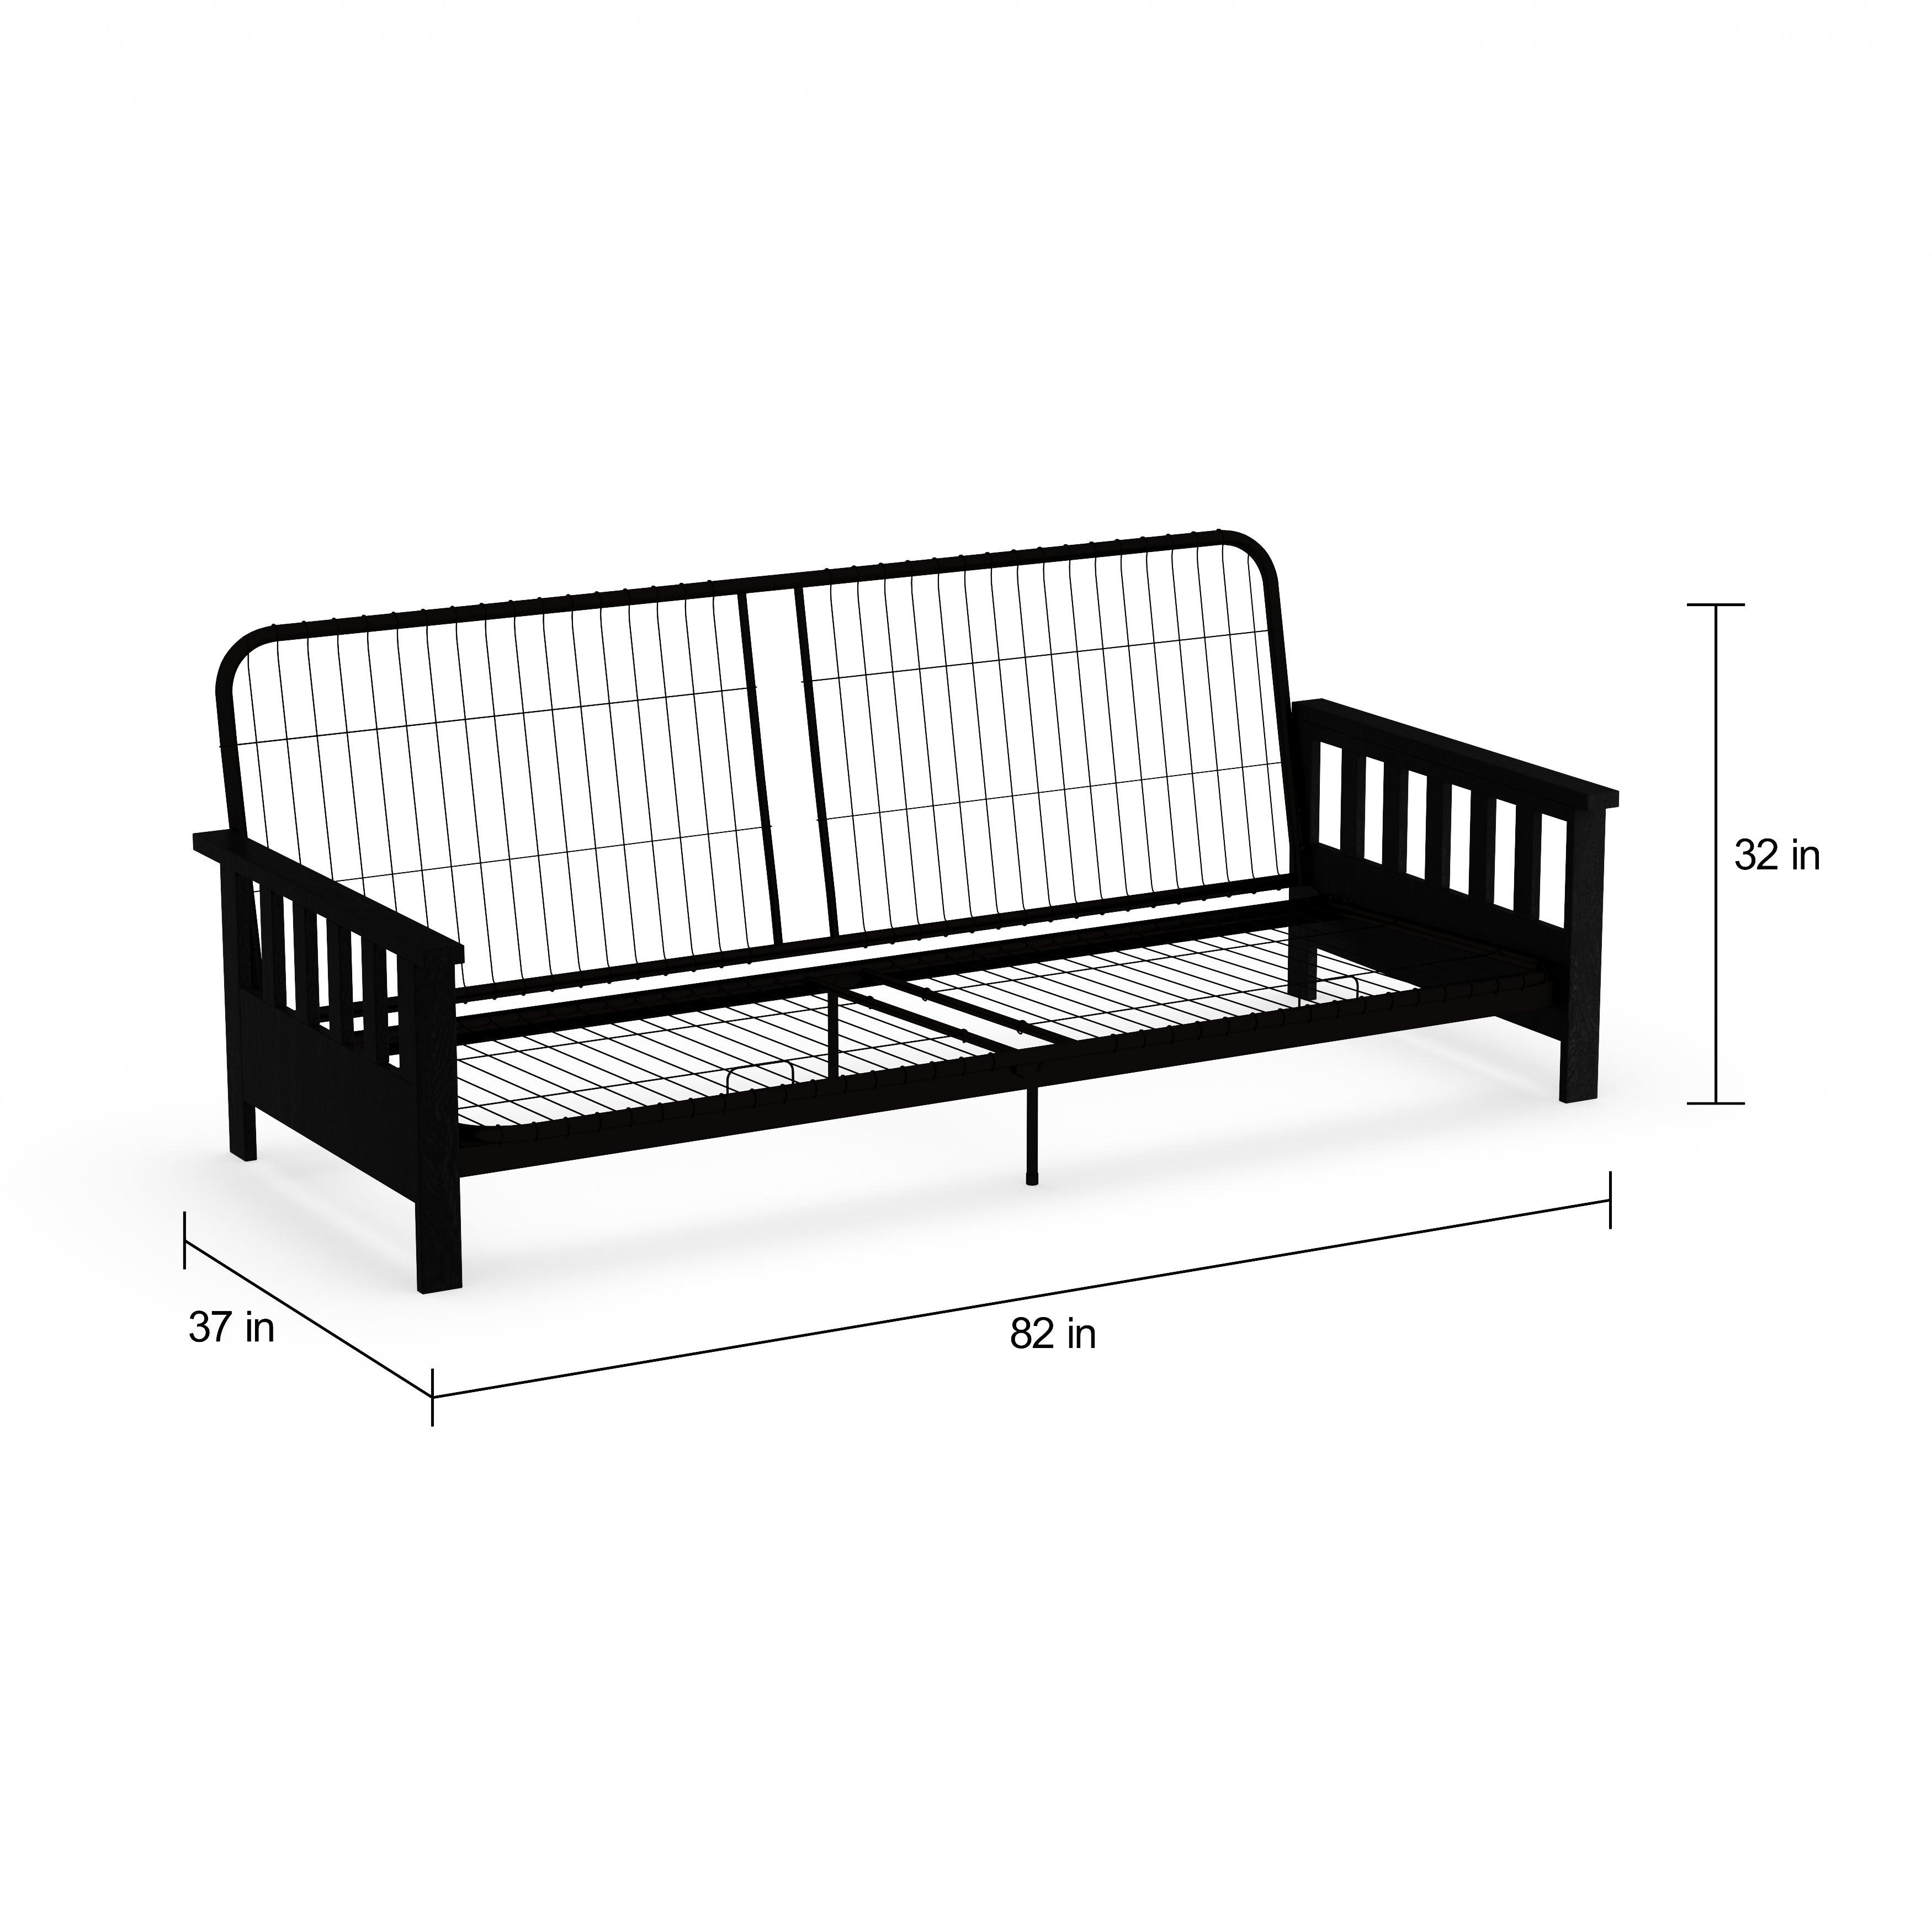 Porch Den Sharp Futon Sofa Sleeper Frame Free Shipping Today Com 20469377